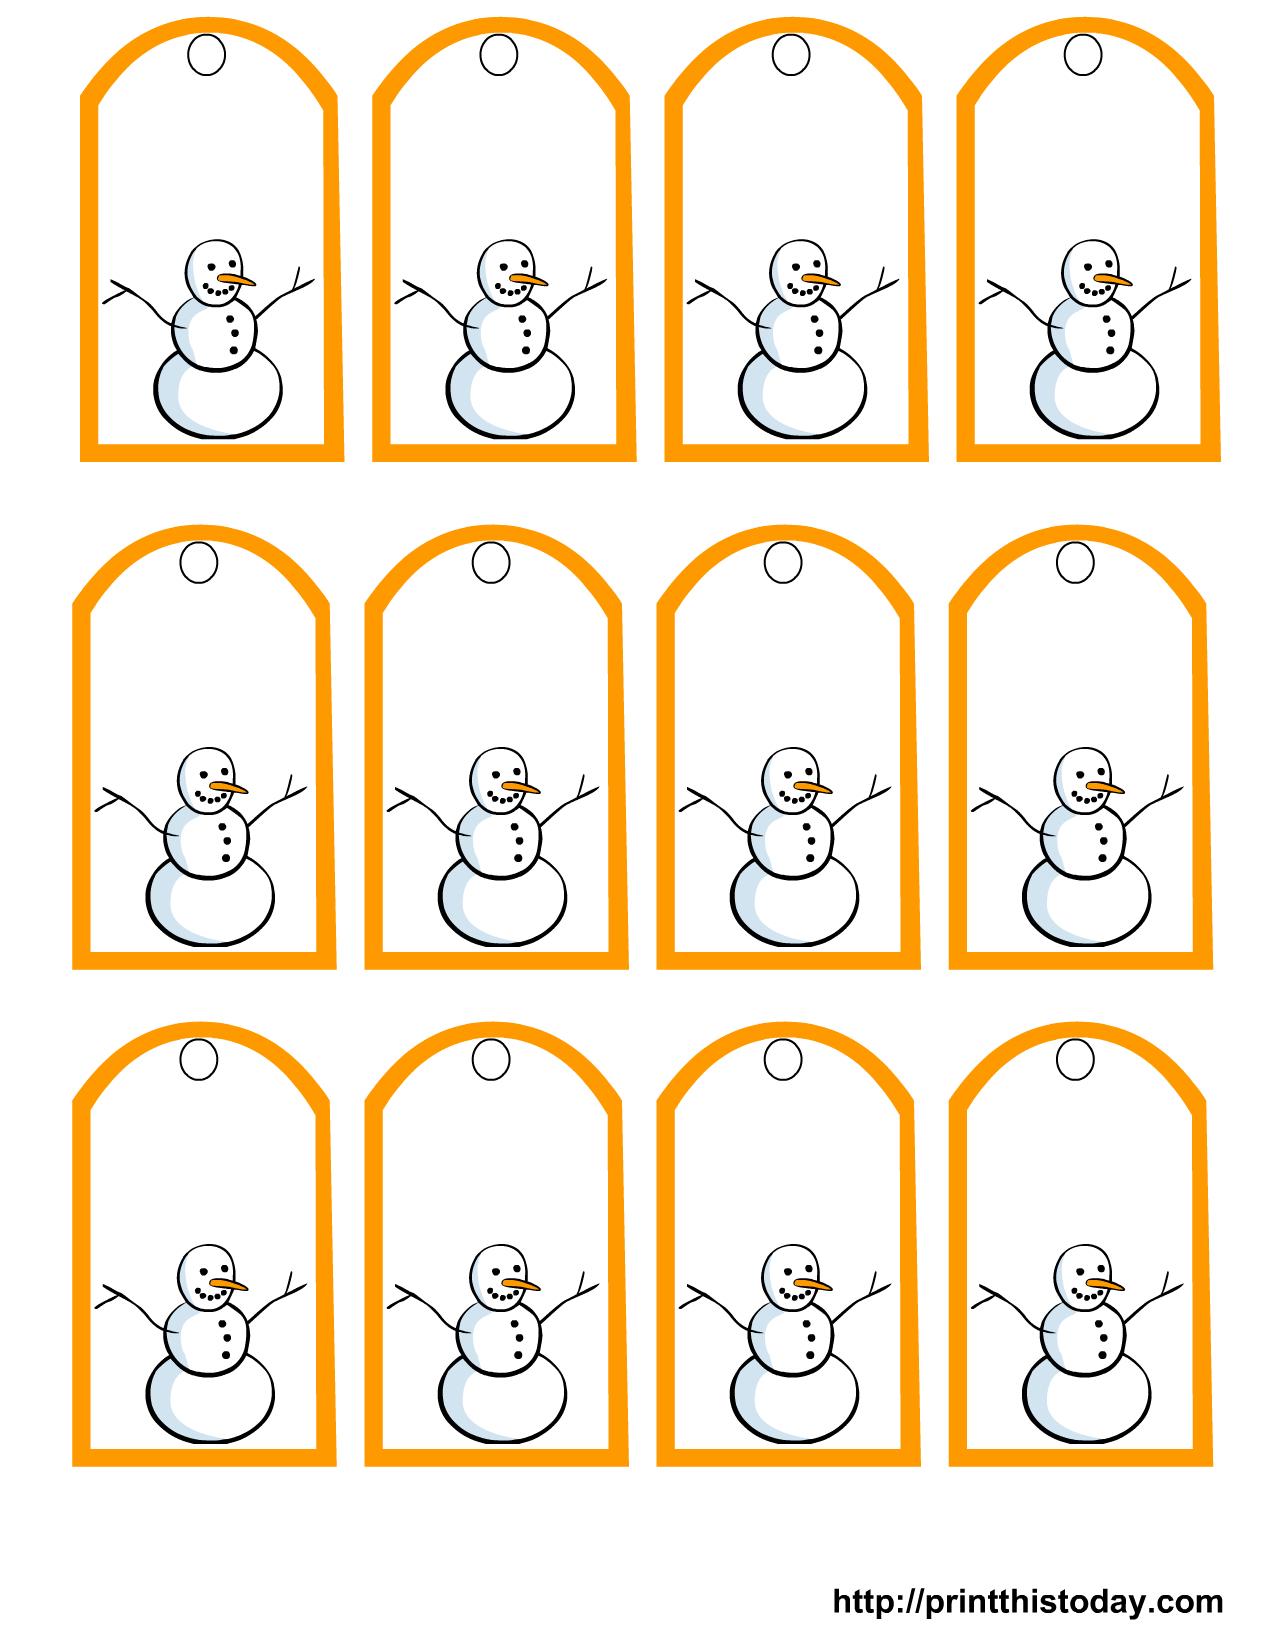 Free Printable Snowman Christmas Gift Tags - Free Printable Holiday Gift Labels